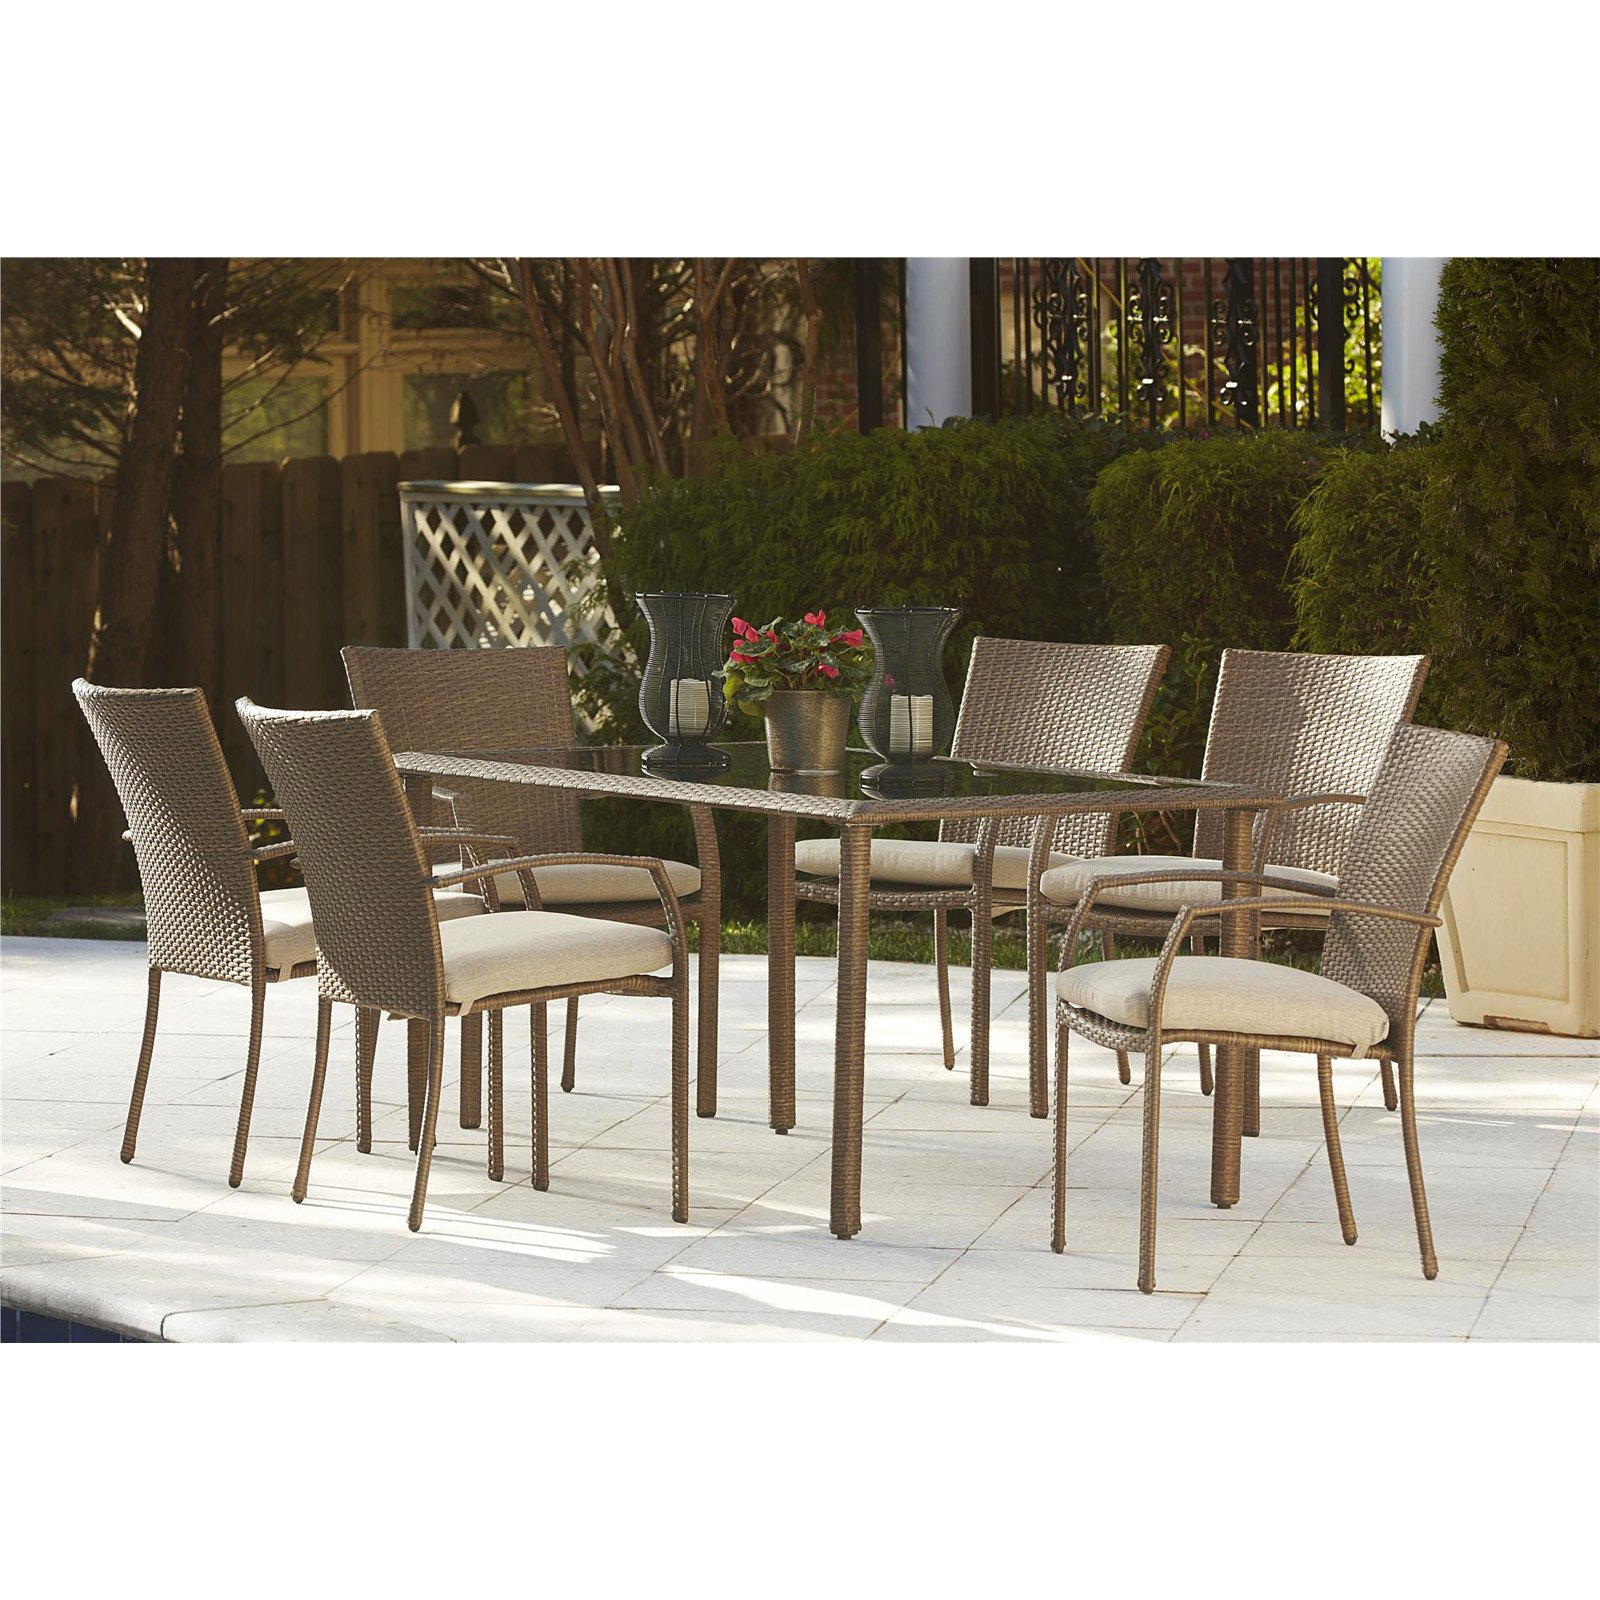 Mainstays Outdoor Patio Deep Seat Cushion Set Multiple Patterns